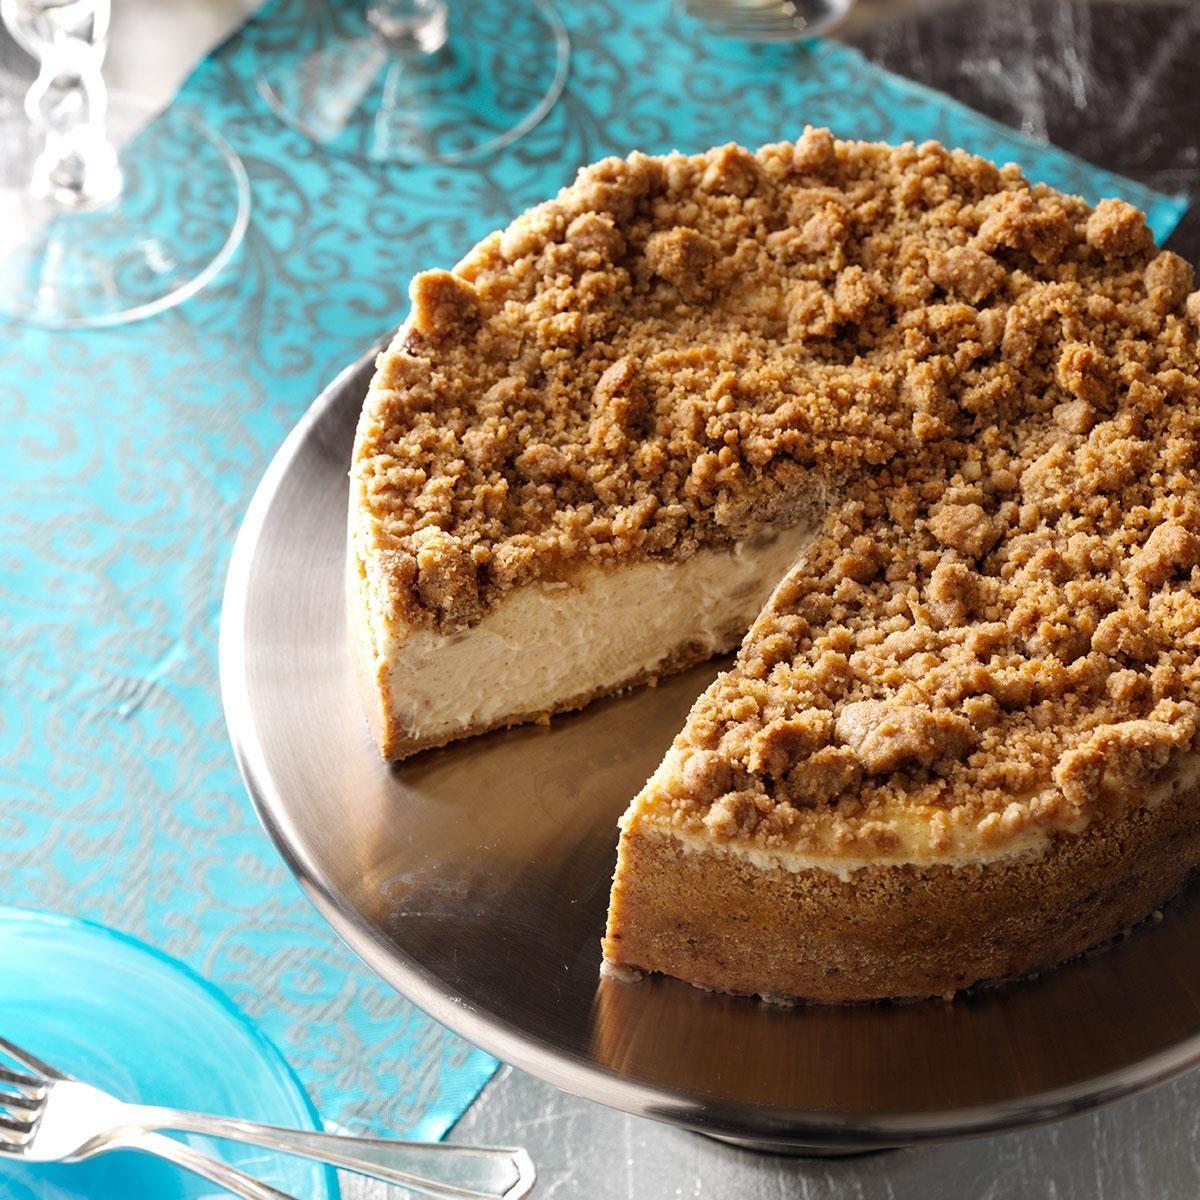 Apple Brandy Cheesecake Recipe